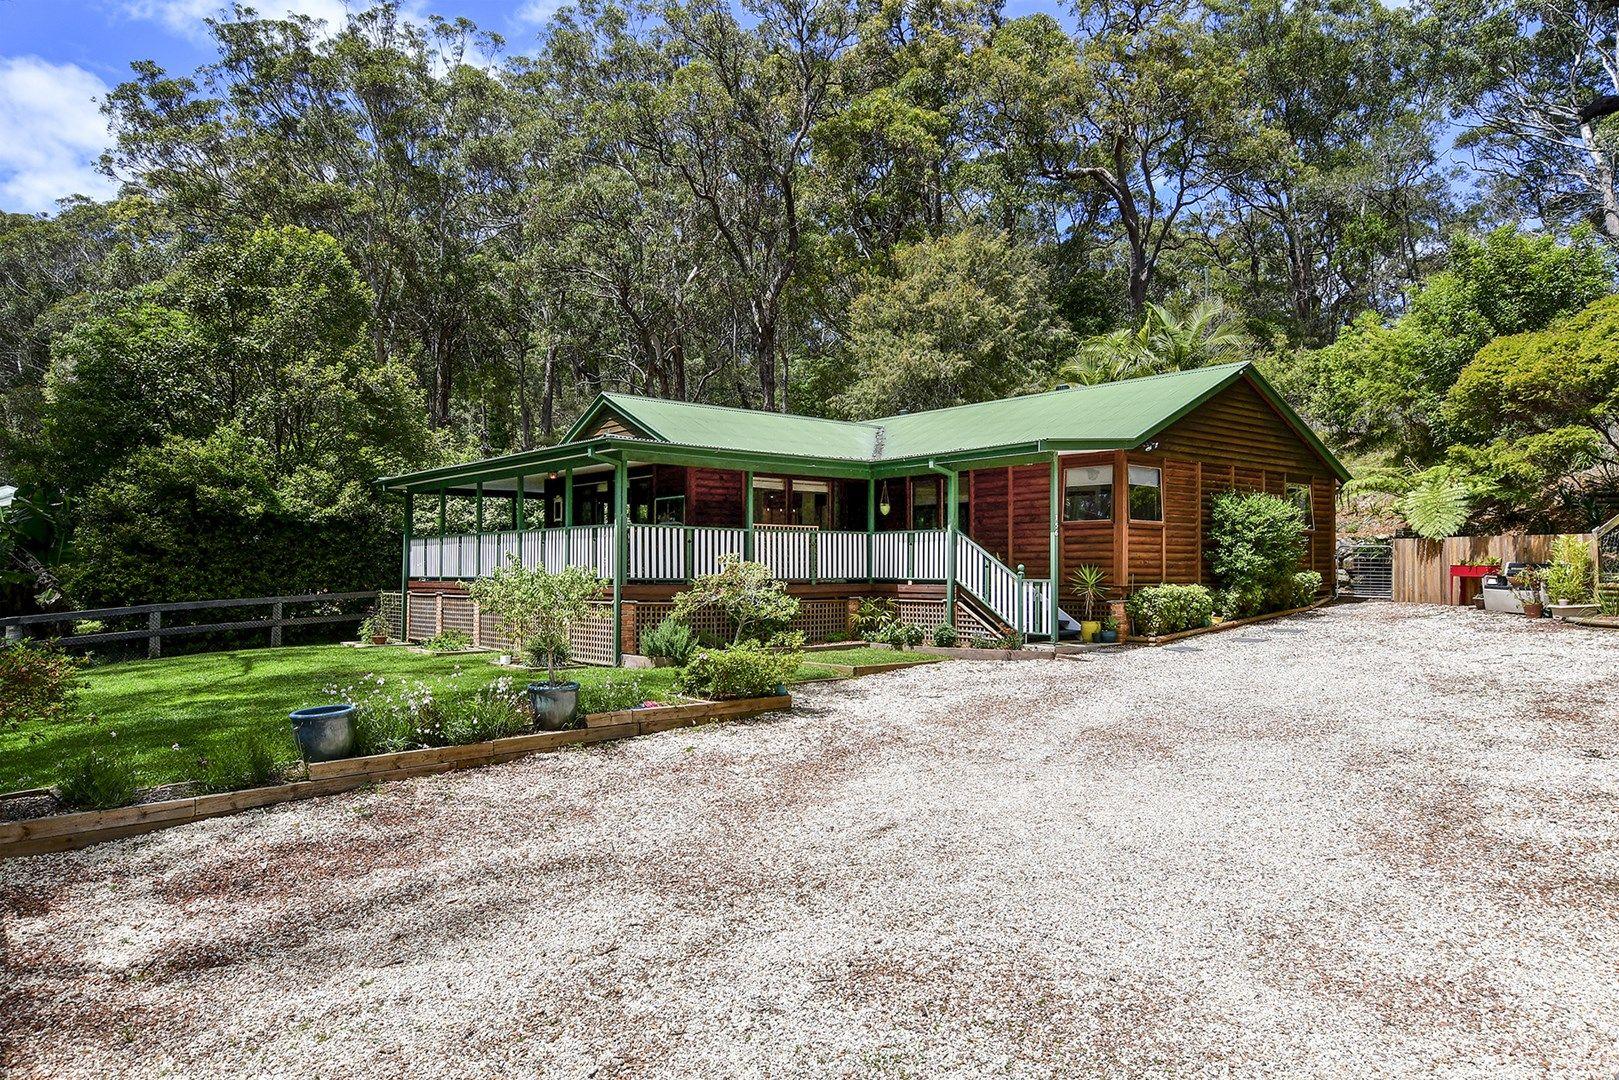 156 Empire Bay Drive, Empire Bay NSW 2257, Image 0